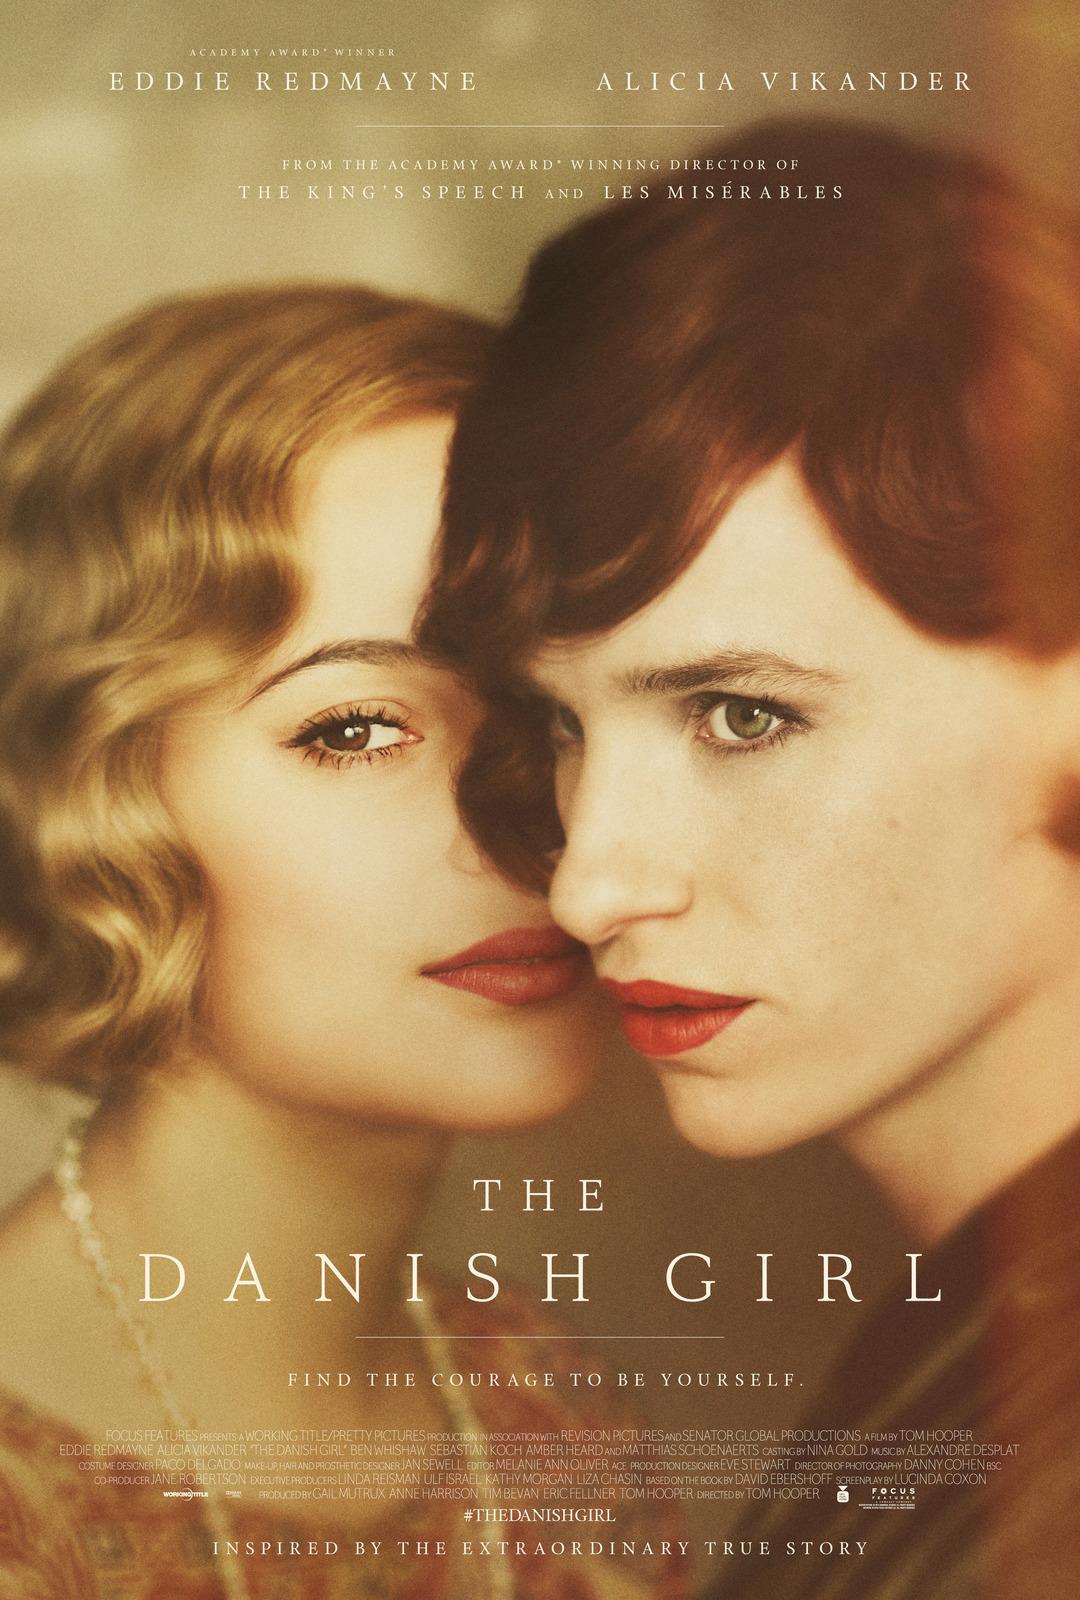 the danish girl movie4k